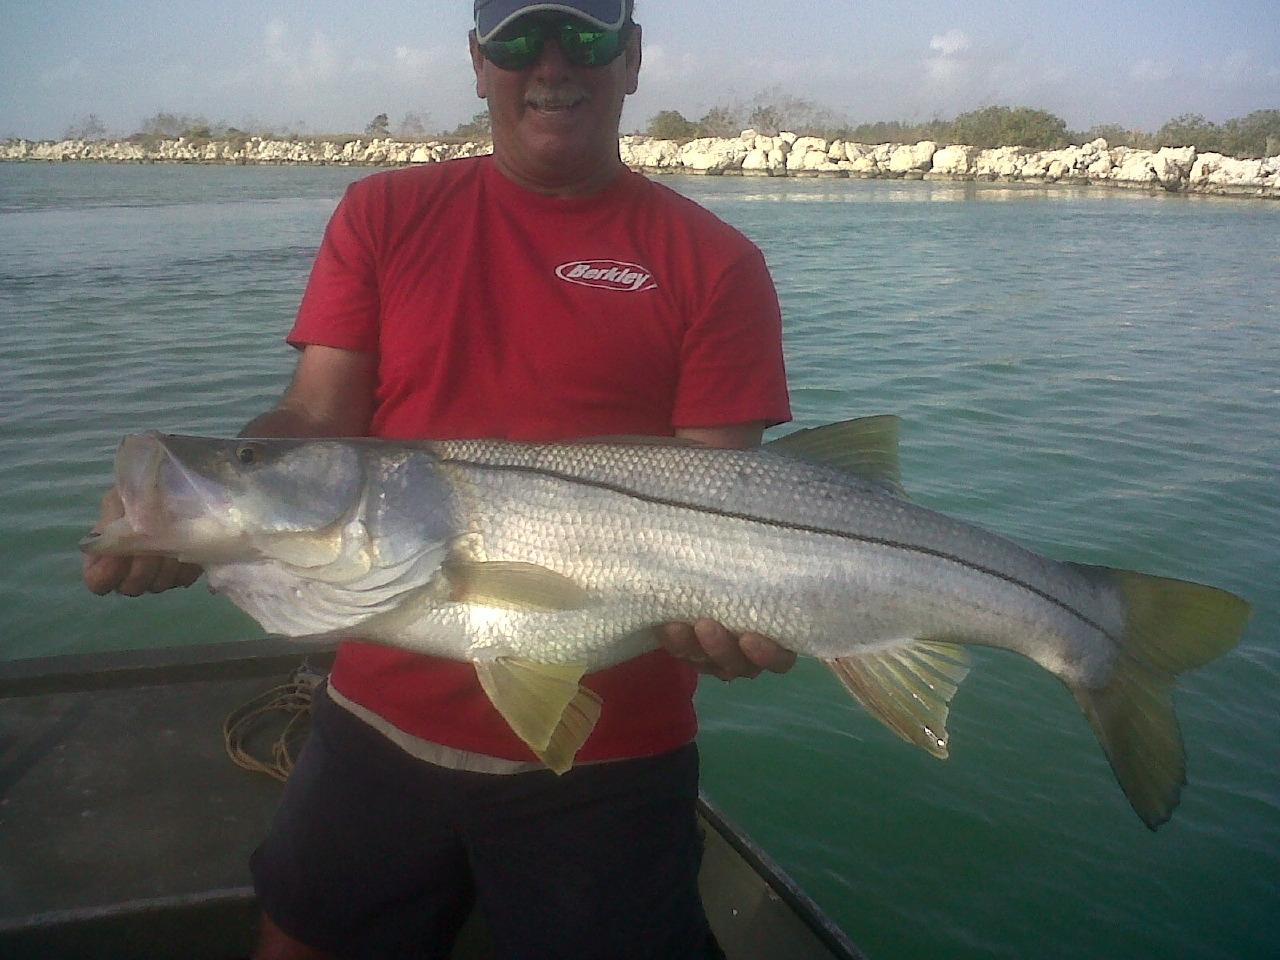 Sustainable fishing in punta cana globalgiving for Punta cana fishing